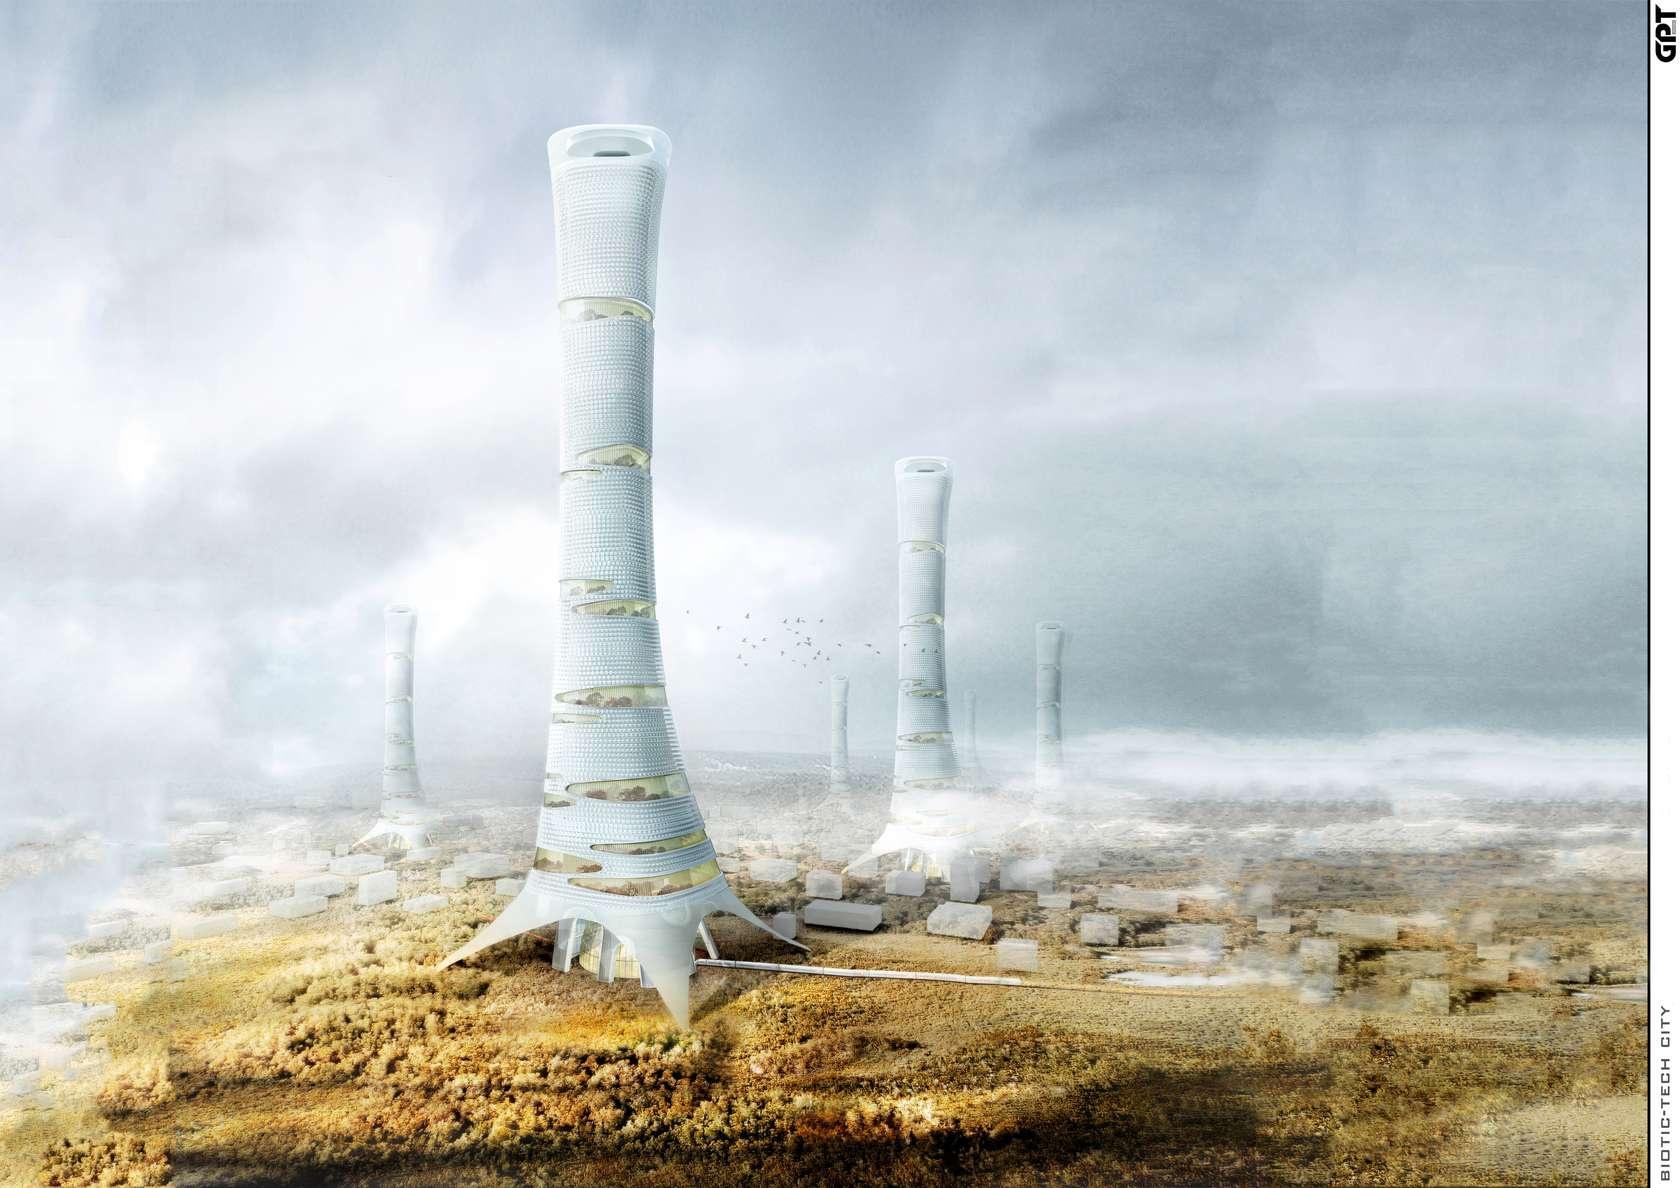 Future Skyscraper Designs images